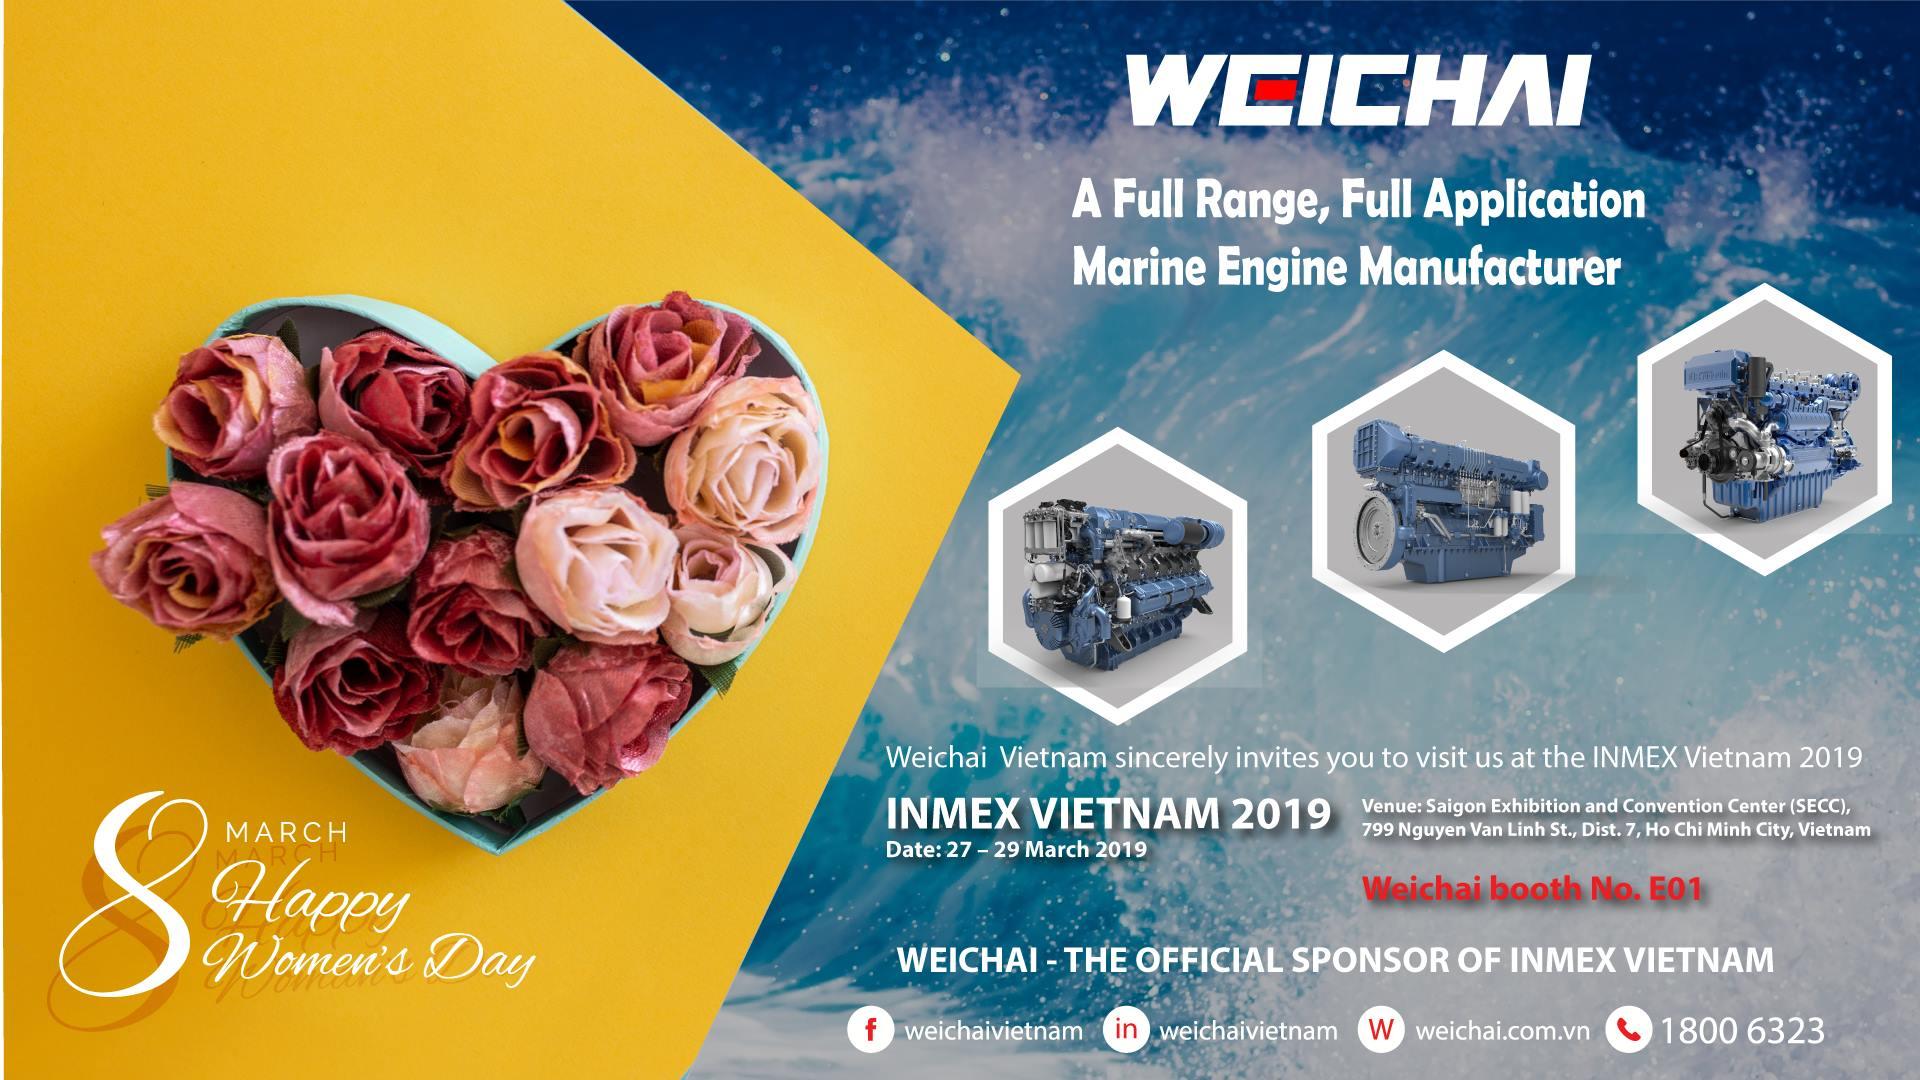 Weichai - A full Range, full Application Marine Engine Manufacturer